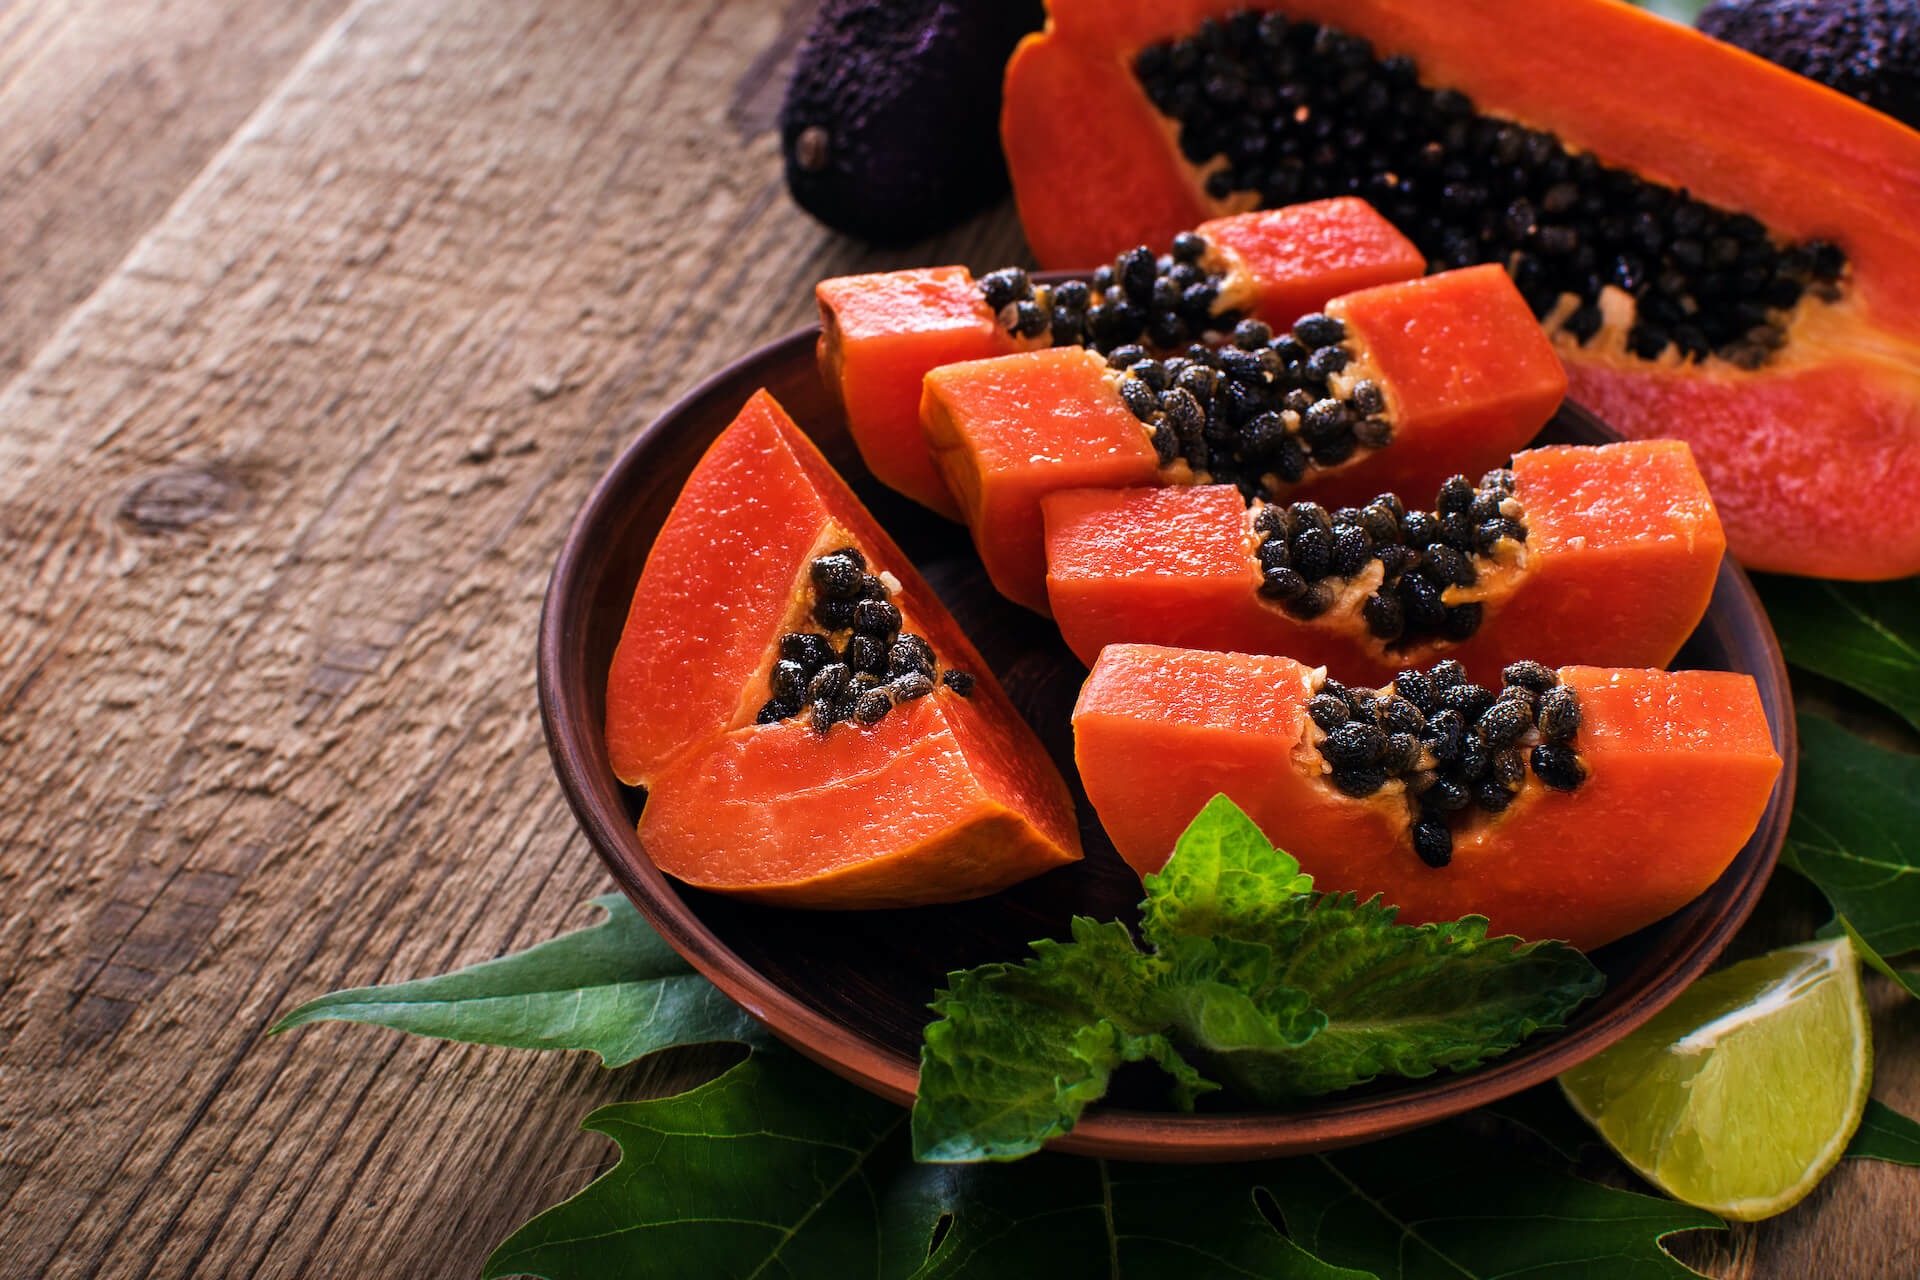 a bowl with a colorful papaya